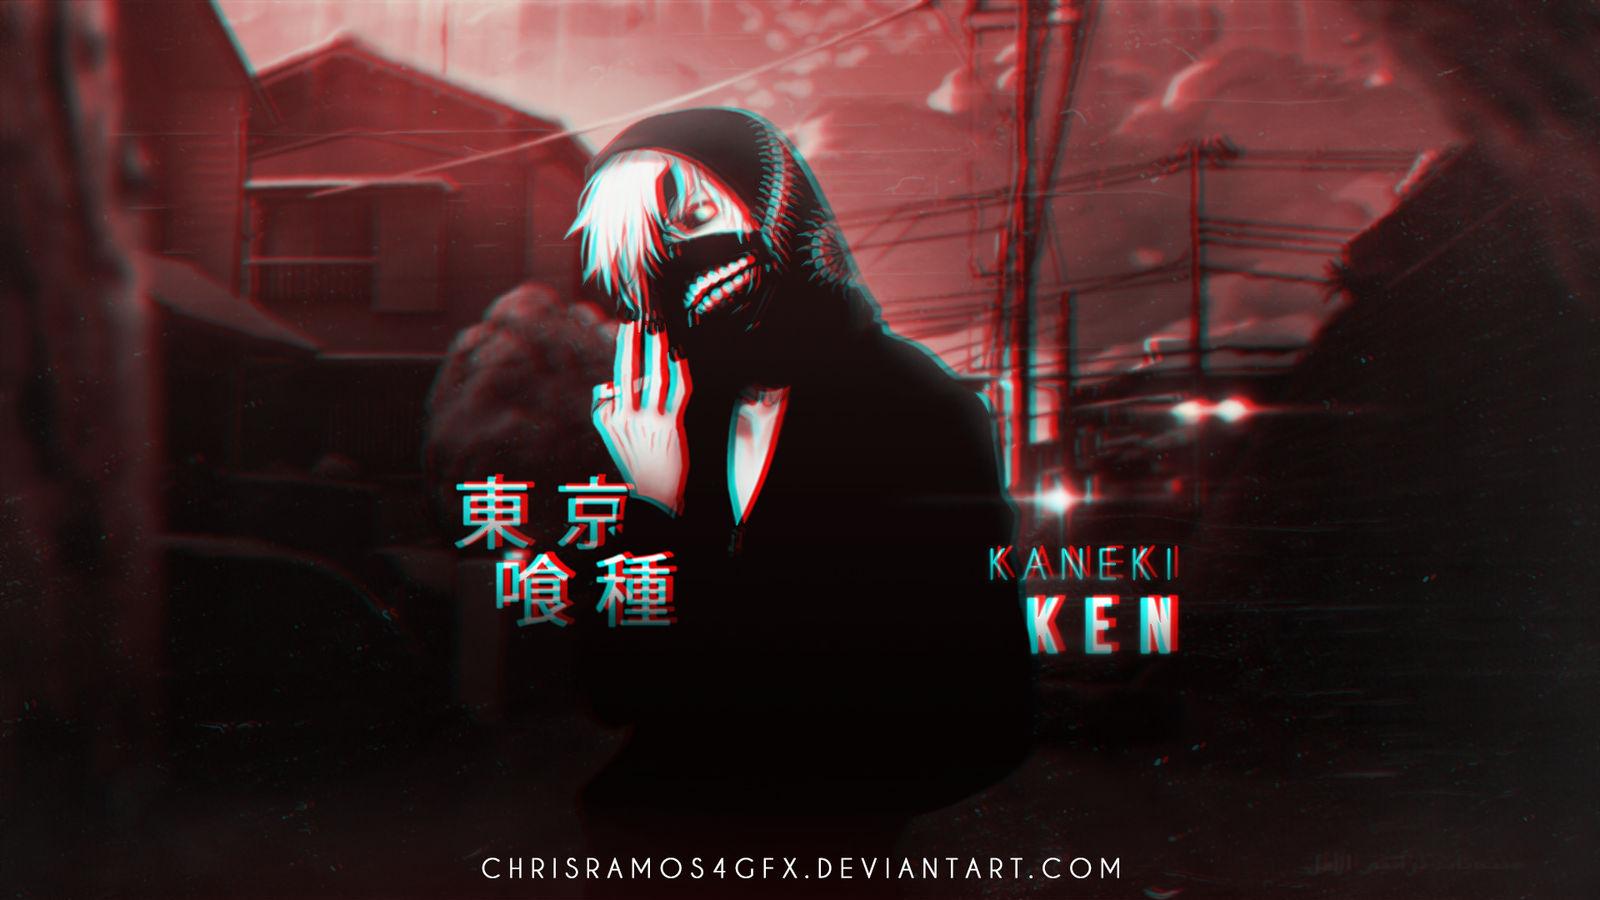 Kaneki Ken |Tokyo Ghoul| Wallpaper by ChrisRamos4GFX on